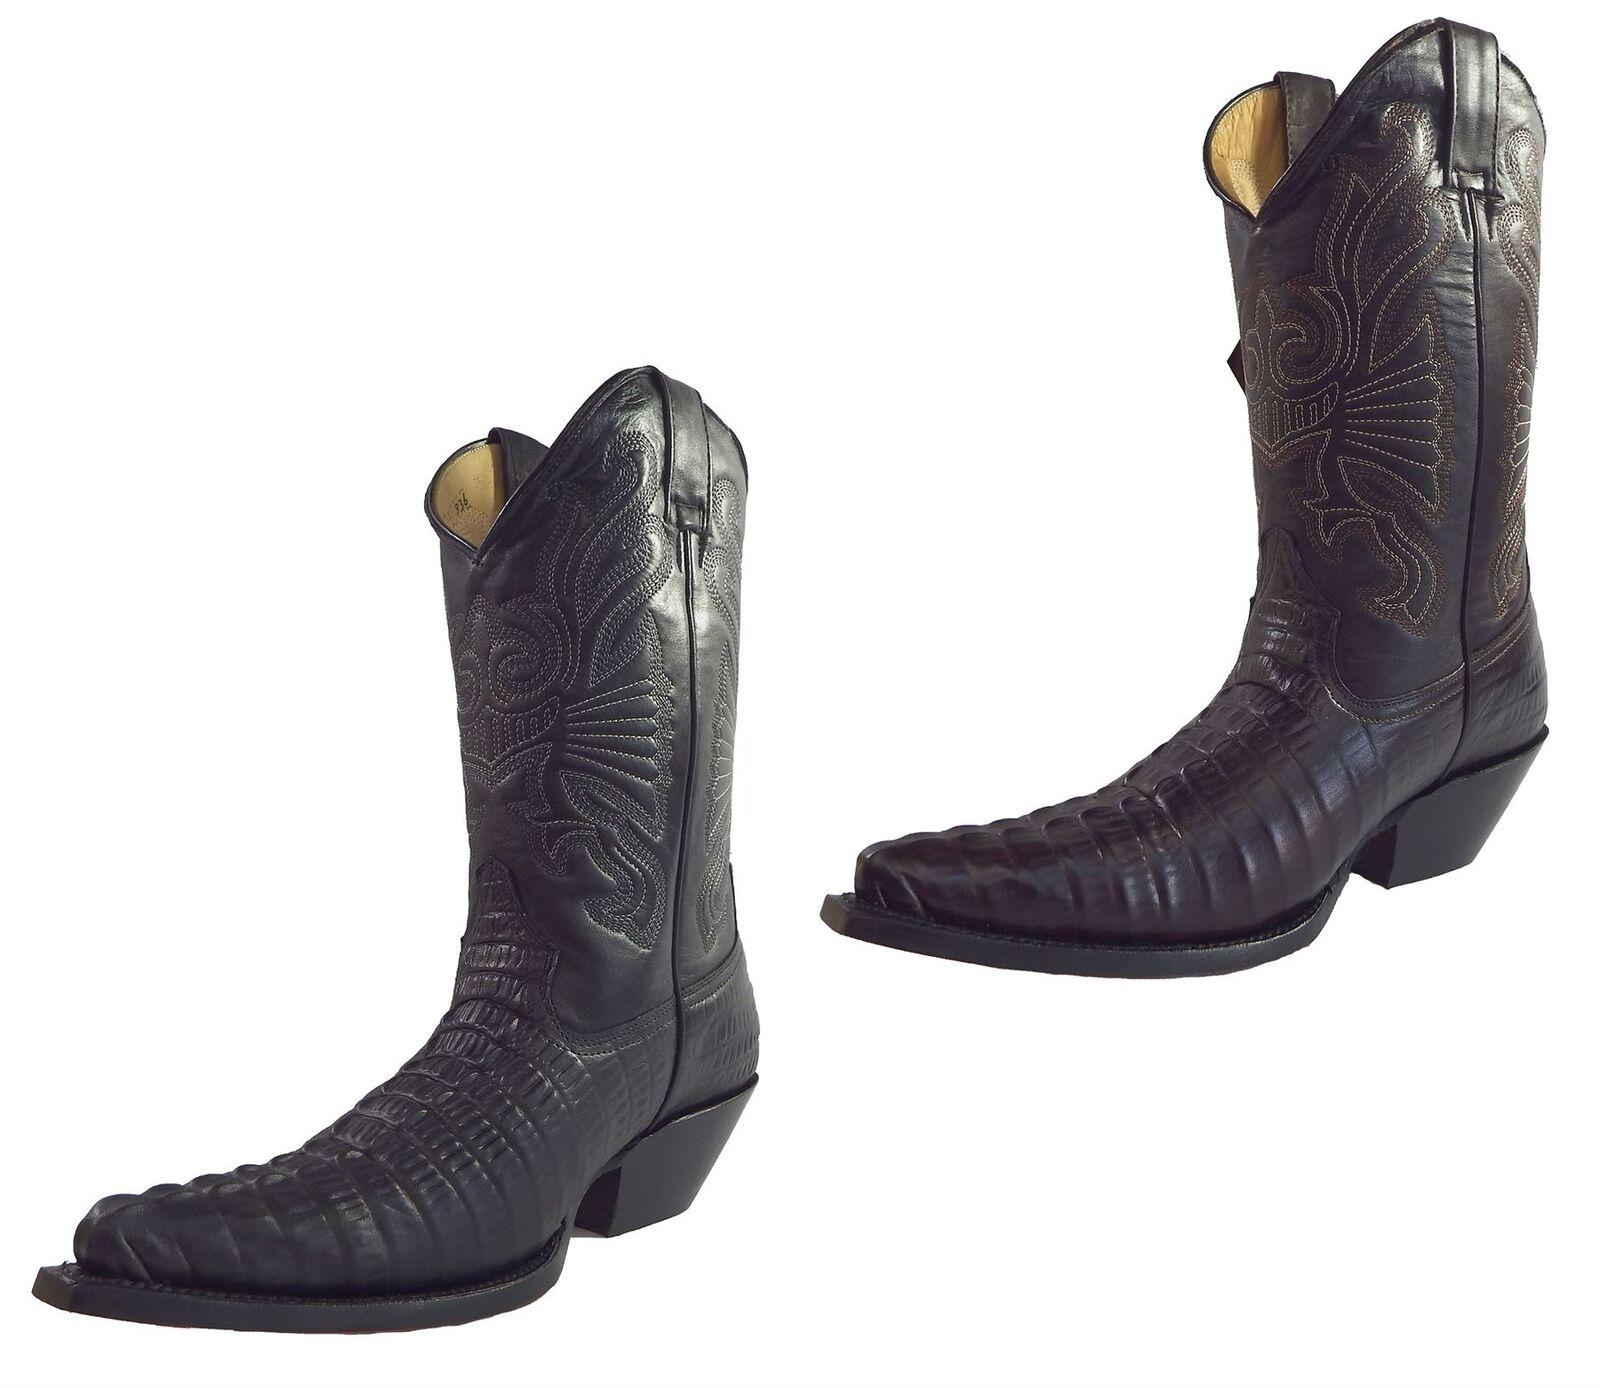 Grinders Carolina Croc Tail in Pelle Messicano Premium Stivali Da Cowboy Messicano Pelle 46d4ab